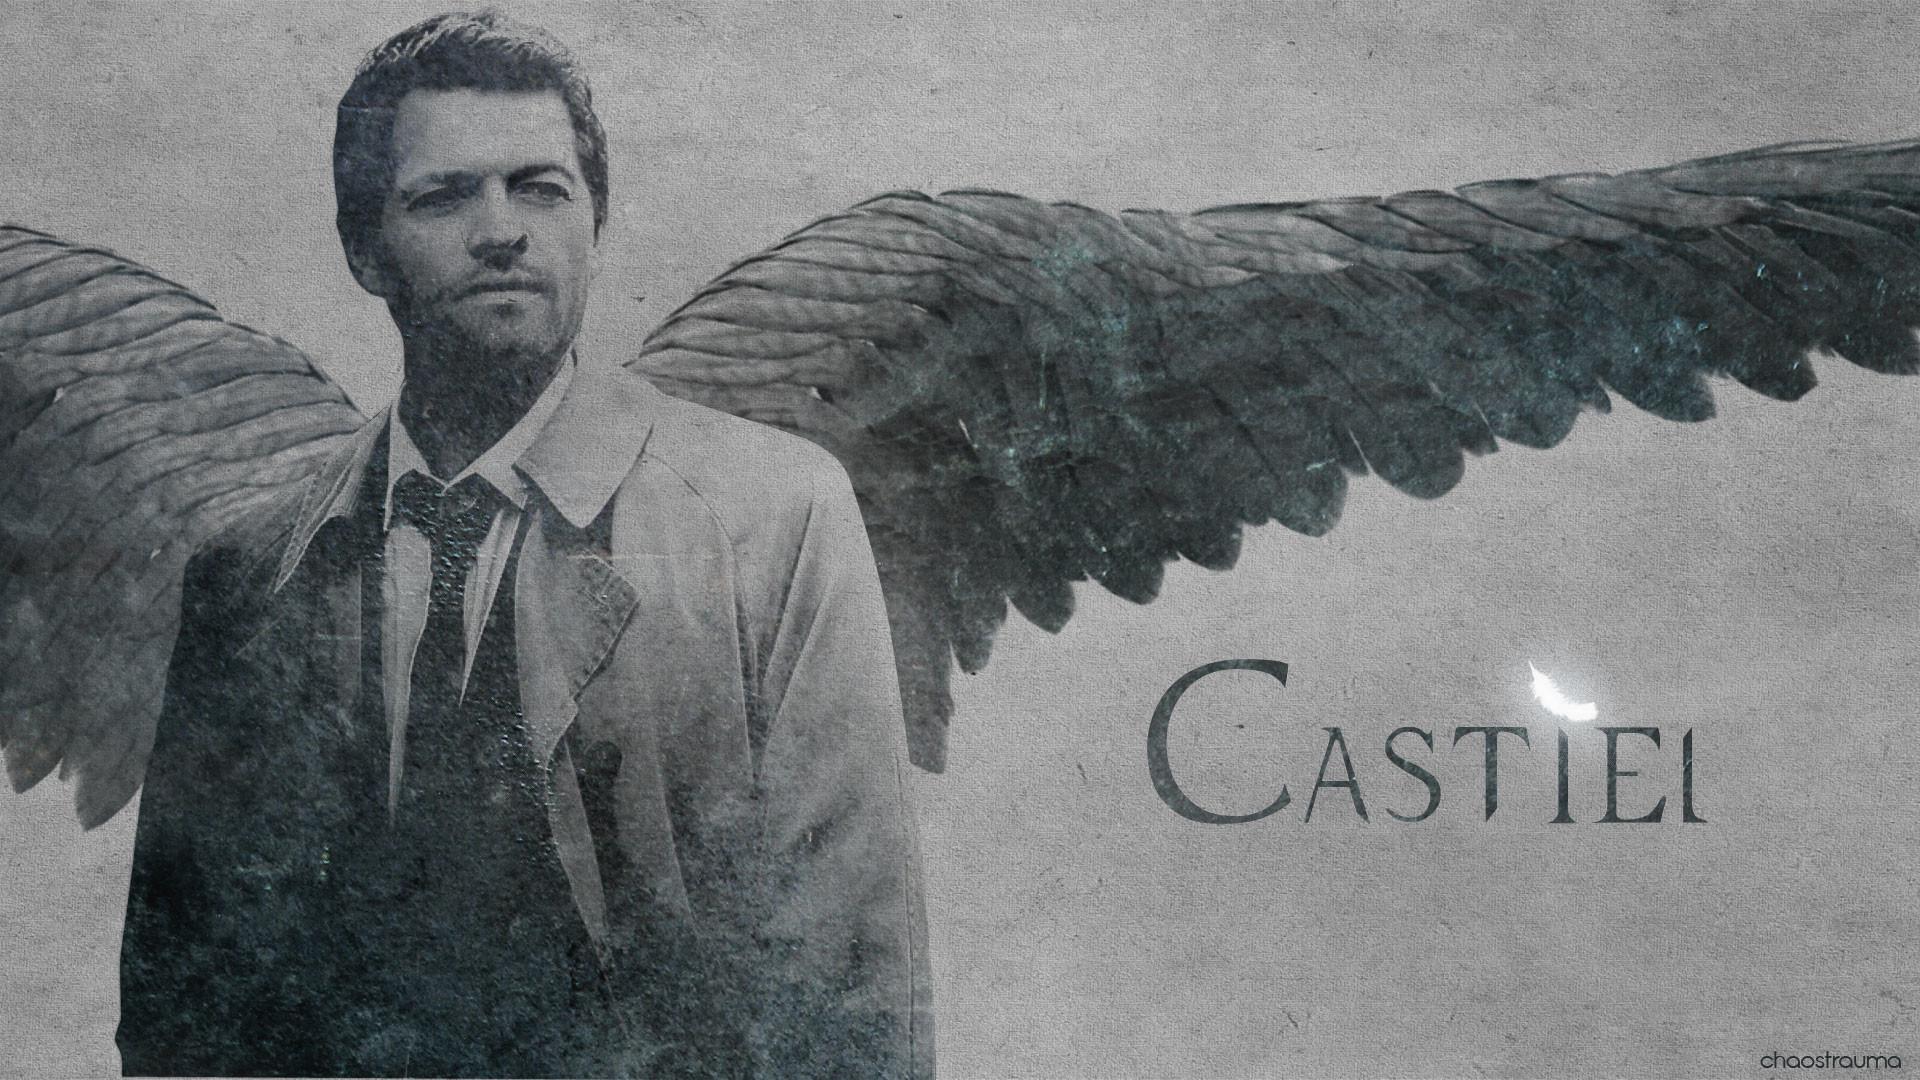 supernatural castiel wallpaper by chaostrauma fan art wallpaper movies .